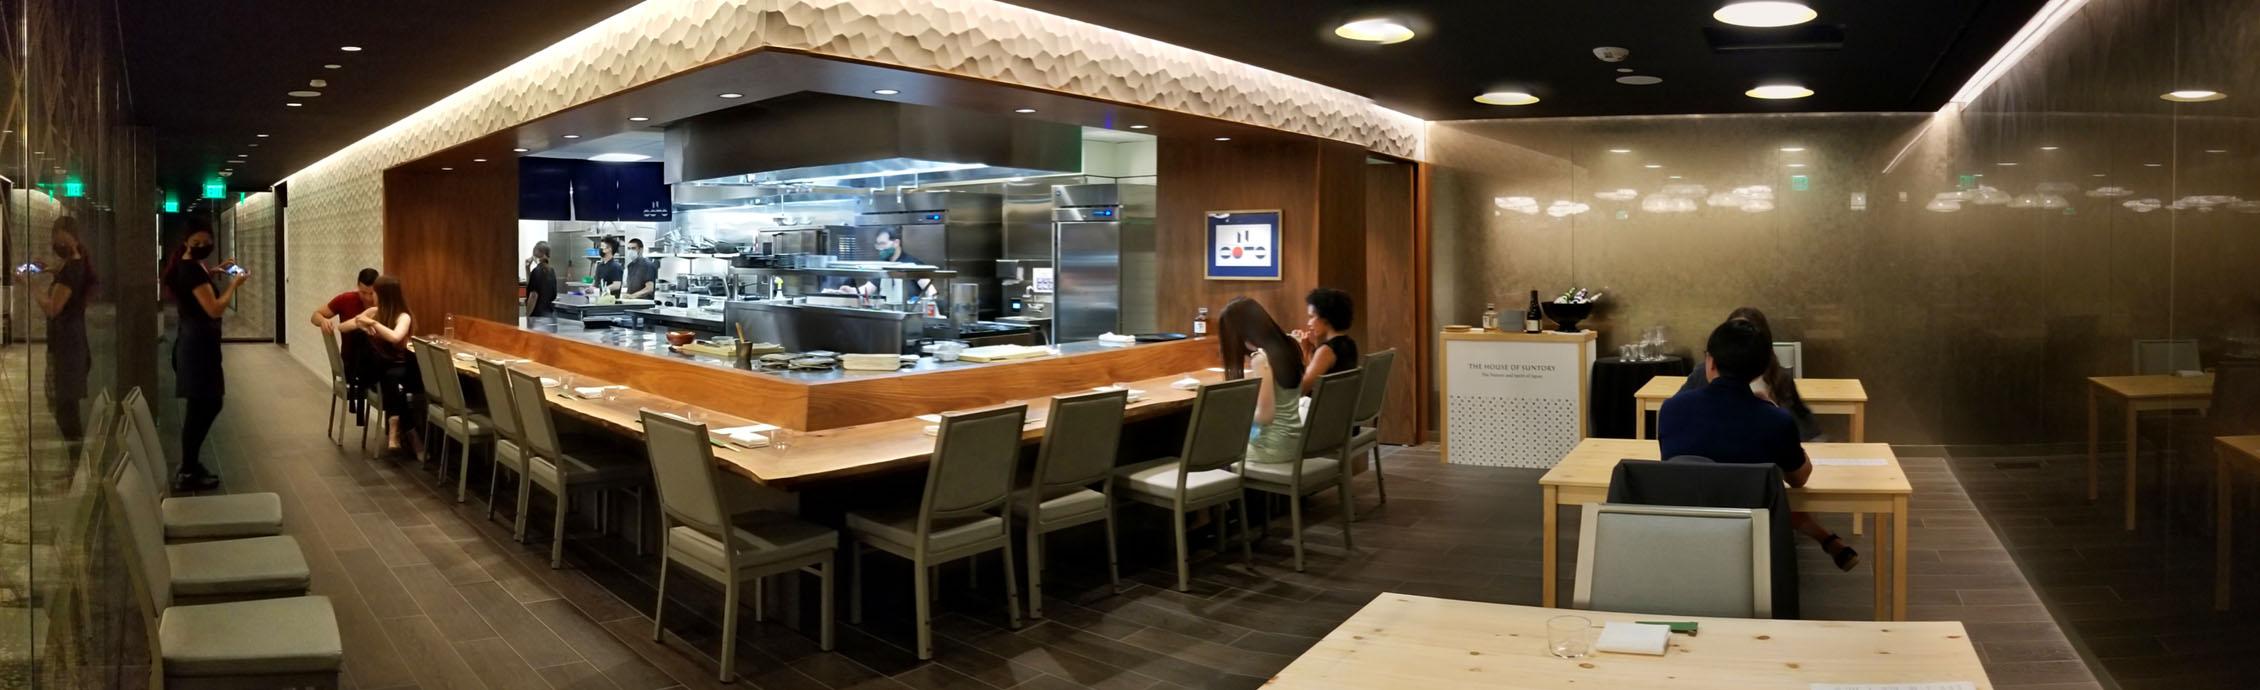 Toshizo Watanabe Culinary Cultural Center Dining Counter